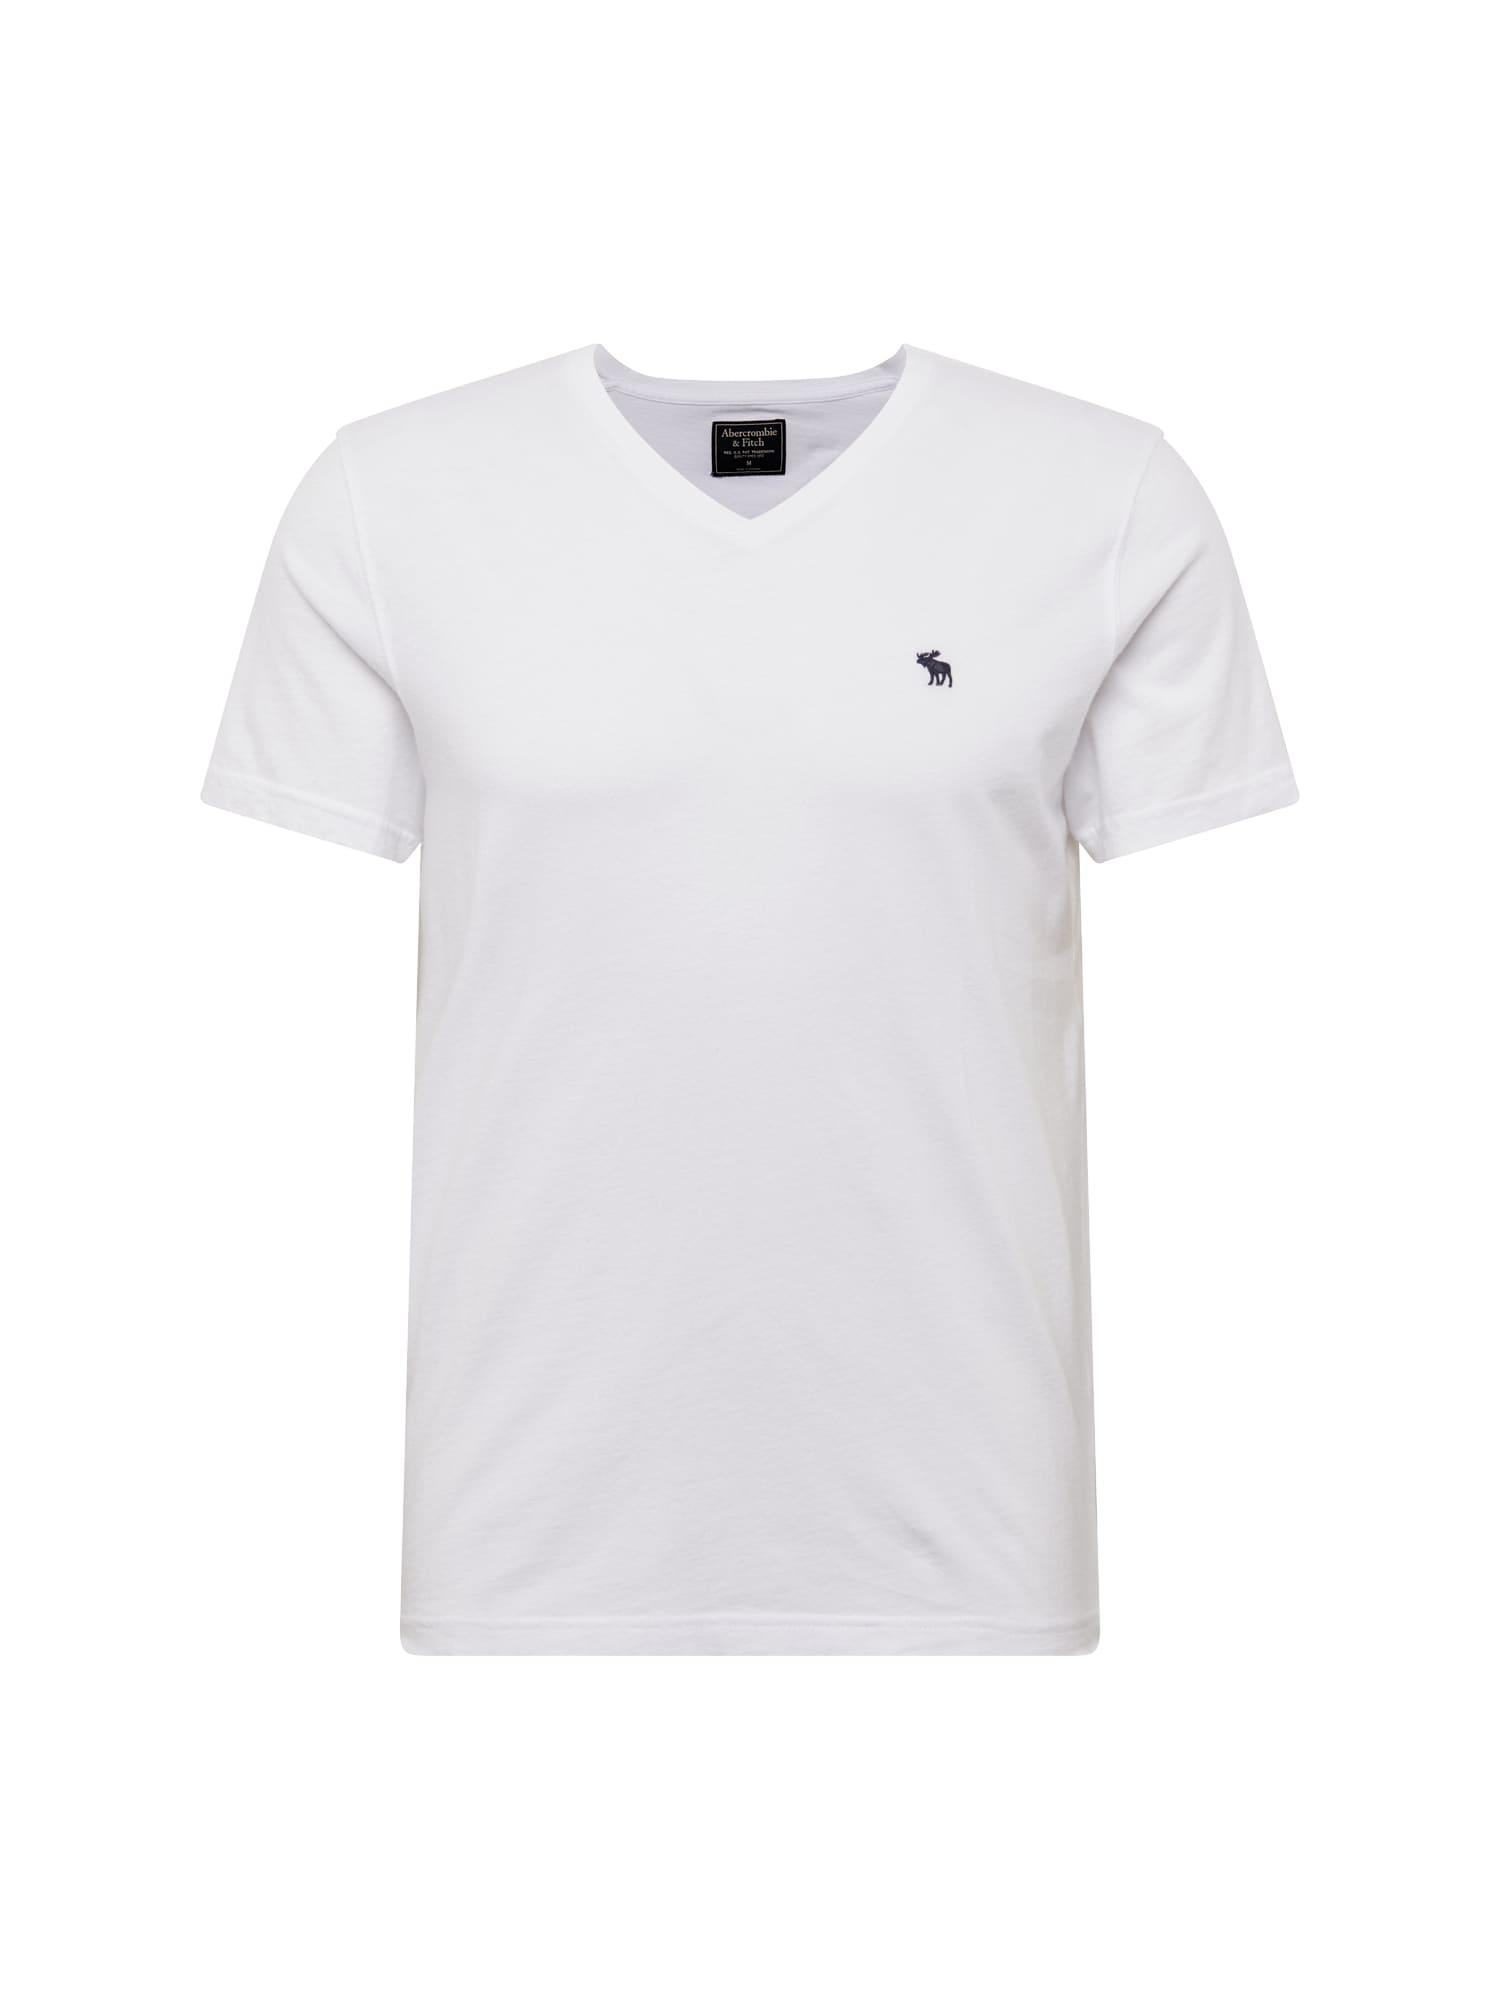 Abercrombie & Fitch Marškinėliai 'GLBL V NECK MULTIPACK' balta